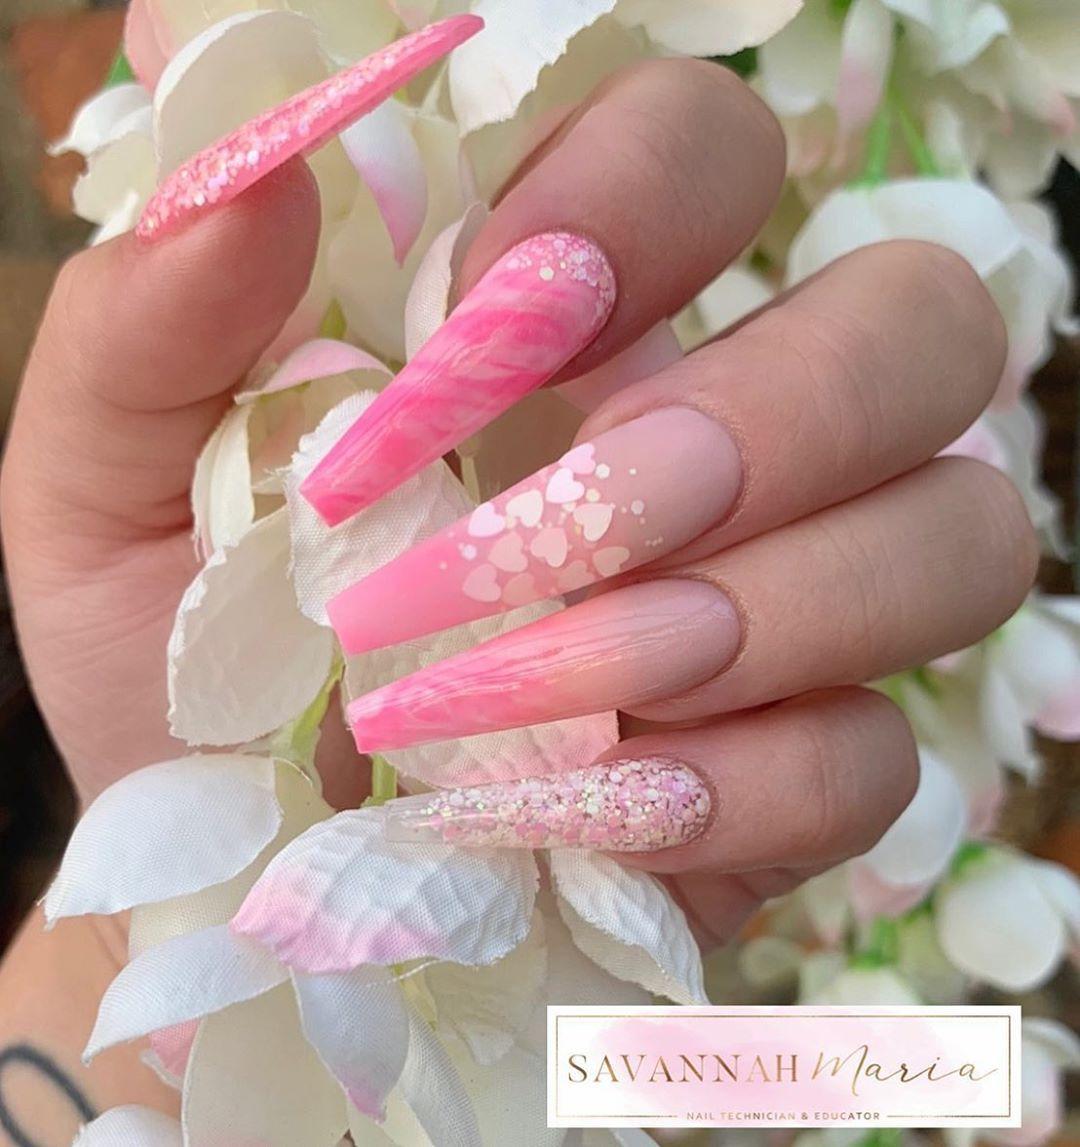 Pink Fluff  ______________________________ Glitterbels Acrylics : • Pink Fluff •..., #acrylicnails #allacrylic #allpowder #bristolnails #coffinnails #customnails #glitterbels #glitternails #marblenails #nailedit #nailglam #nailgram #nailmagazine #nailpro #nailpromagazine #nailpromote #nails #nailsbysavannah_xx #nailsdesigns #nailsofinstagram #nailsoftheday #nailsoftheweek #nailsonfleek #nailtech #pinknails #scratchmagazine #showscratch #stilettonails #swarovskicrystals #vanessanailzfeatures